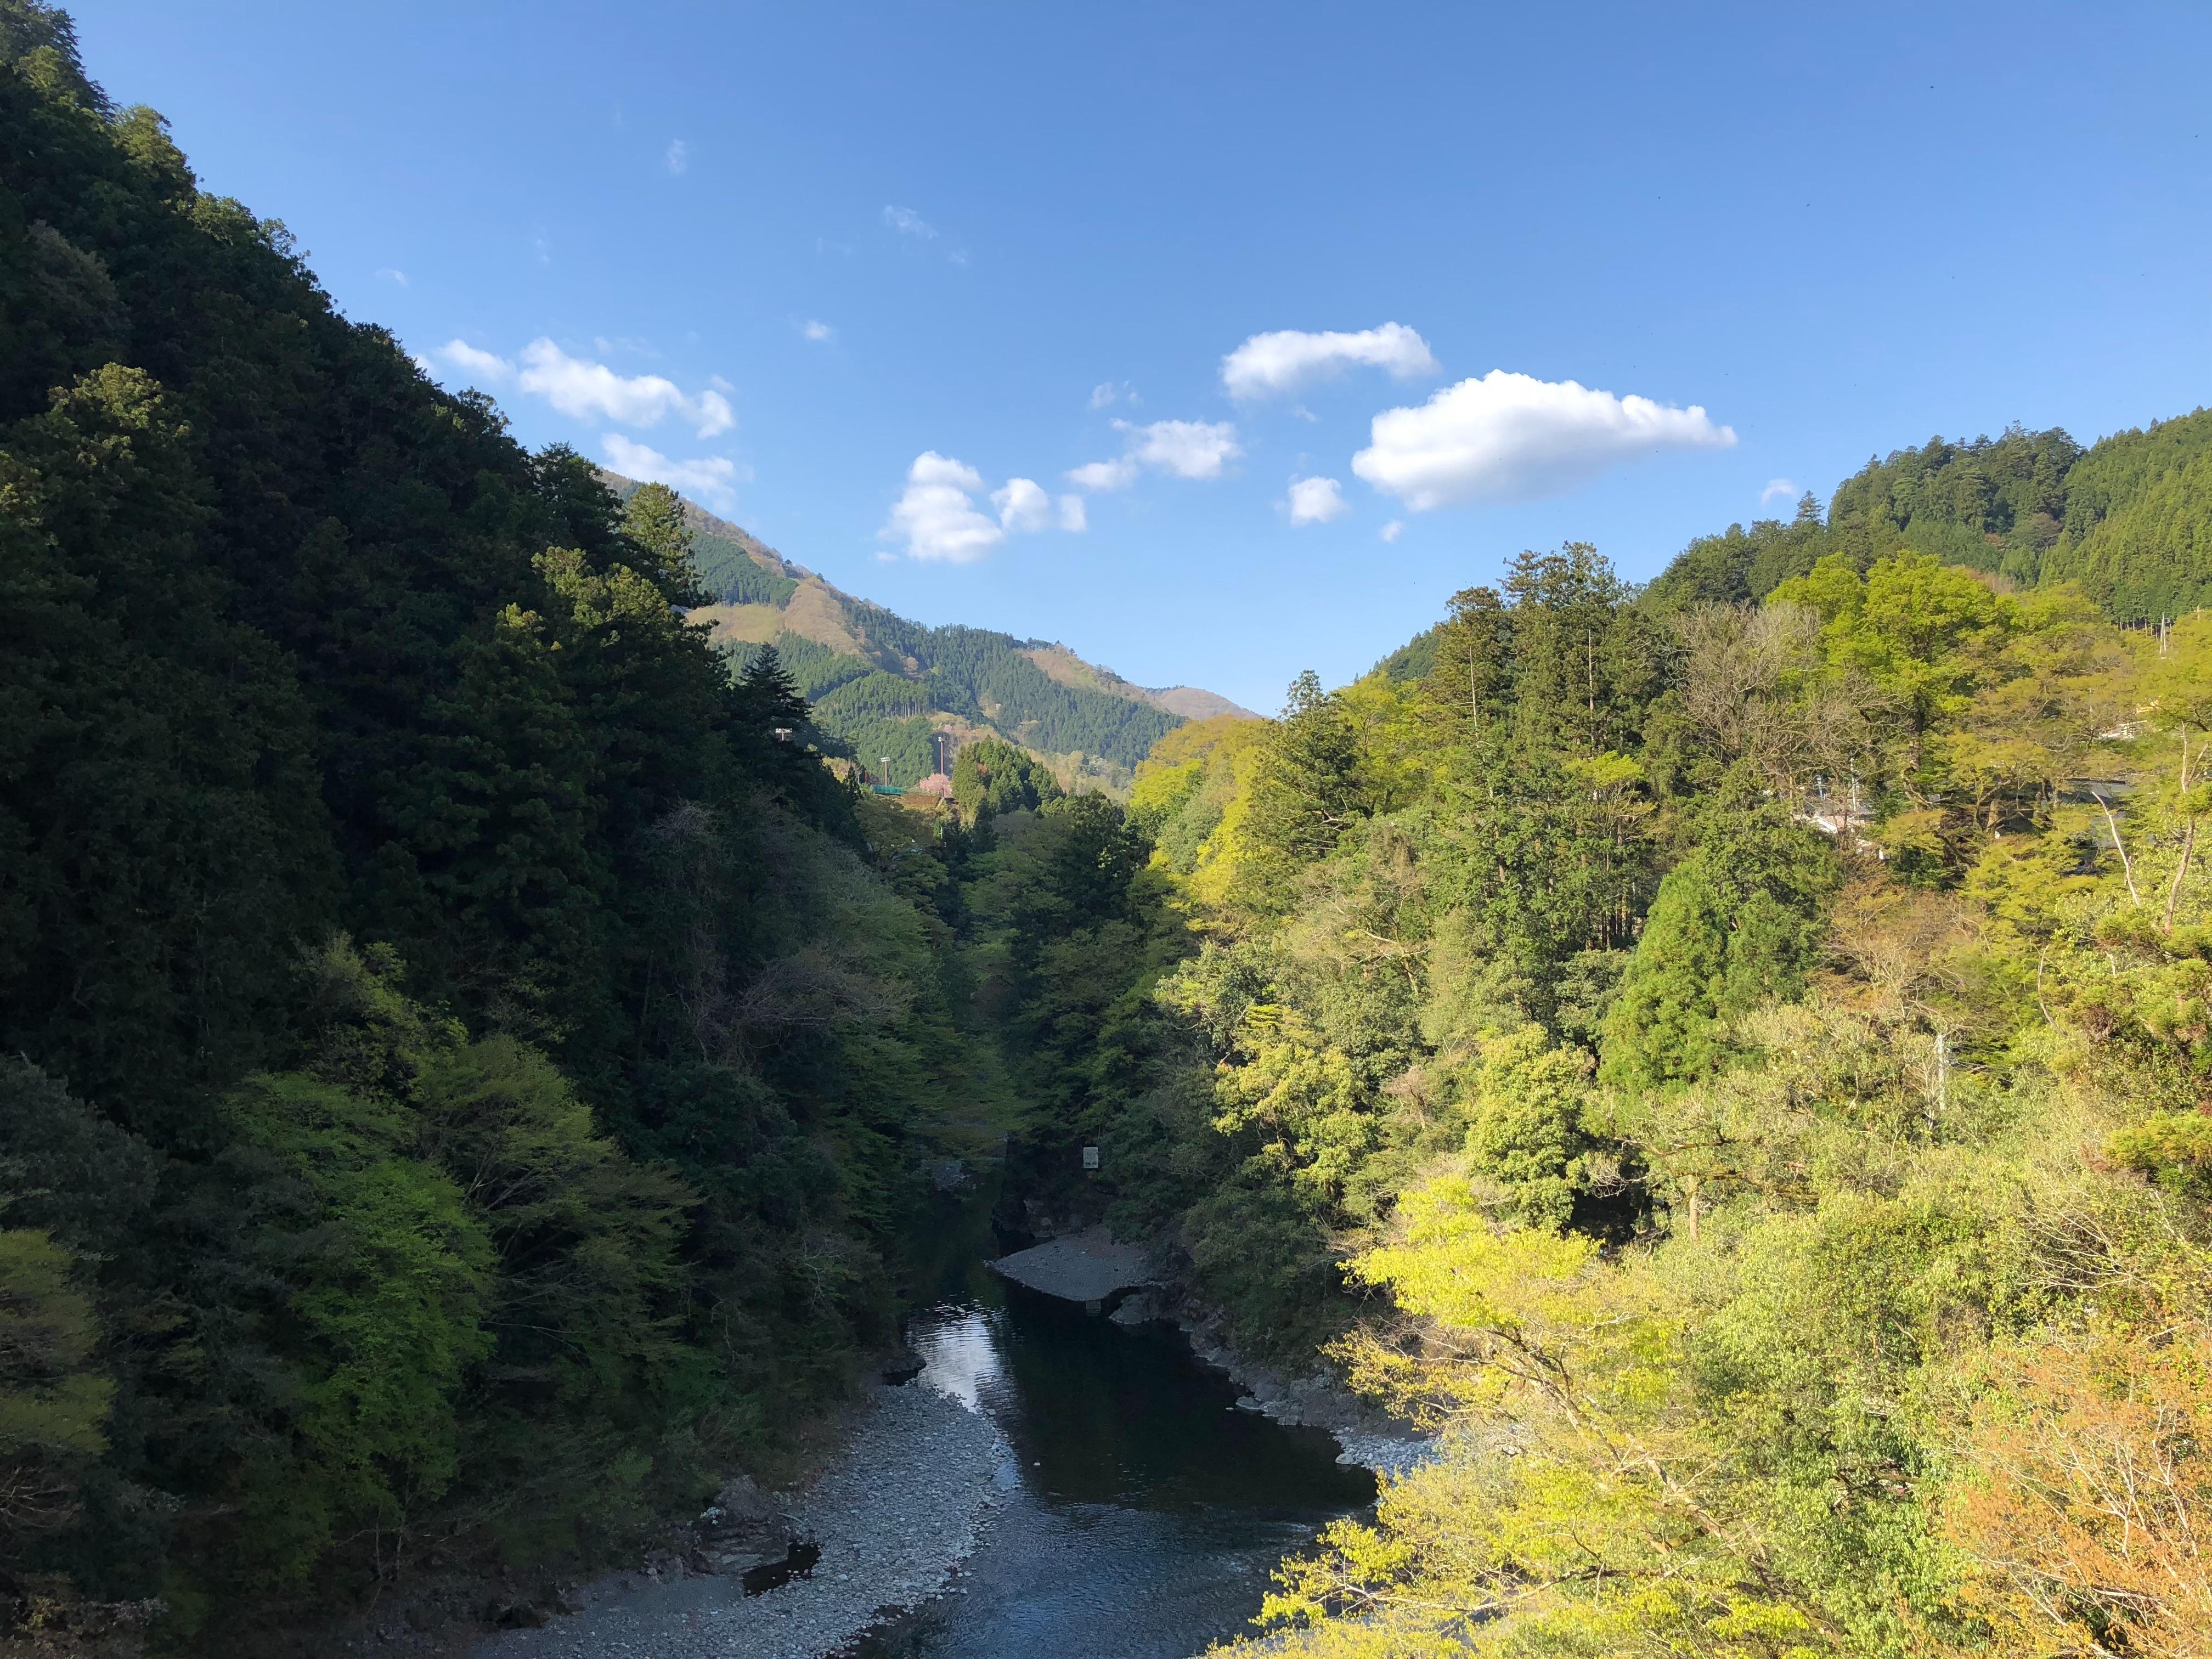 f:id:yanakahachisuke:20180410001352j:image